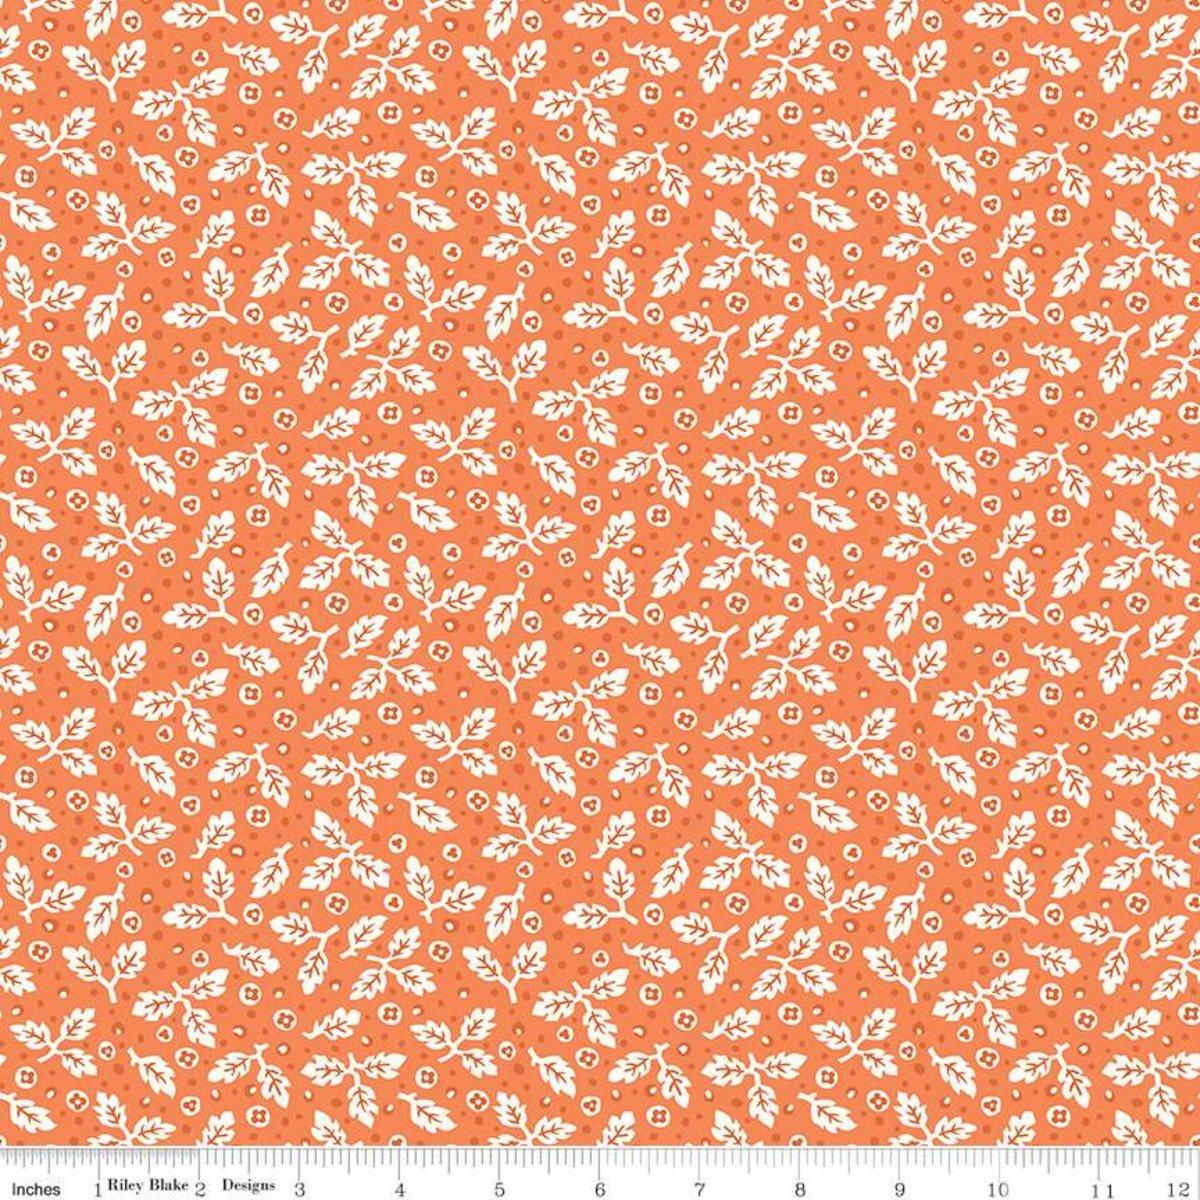 Flea Market C10218 - Pumpkin